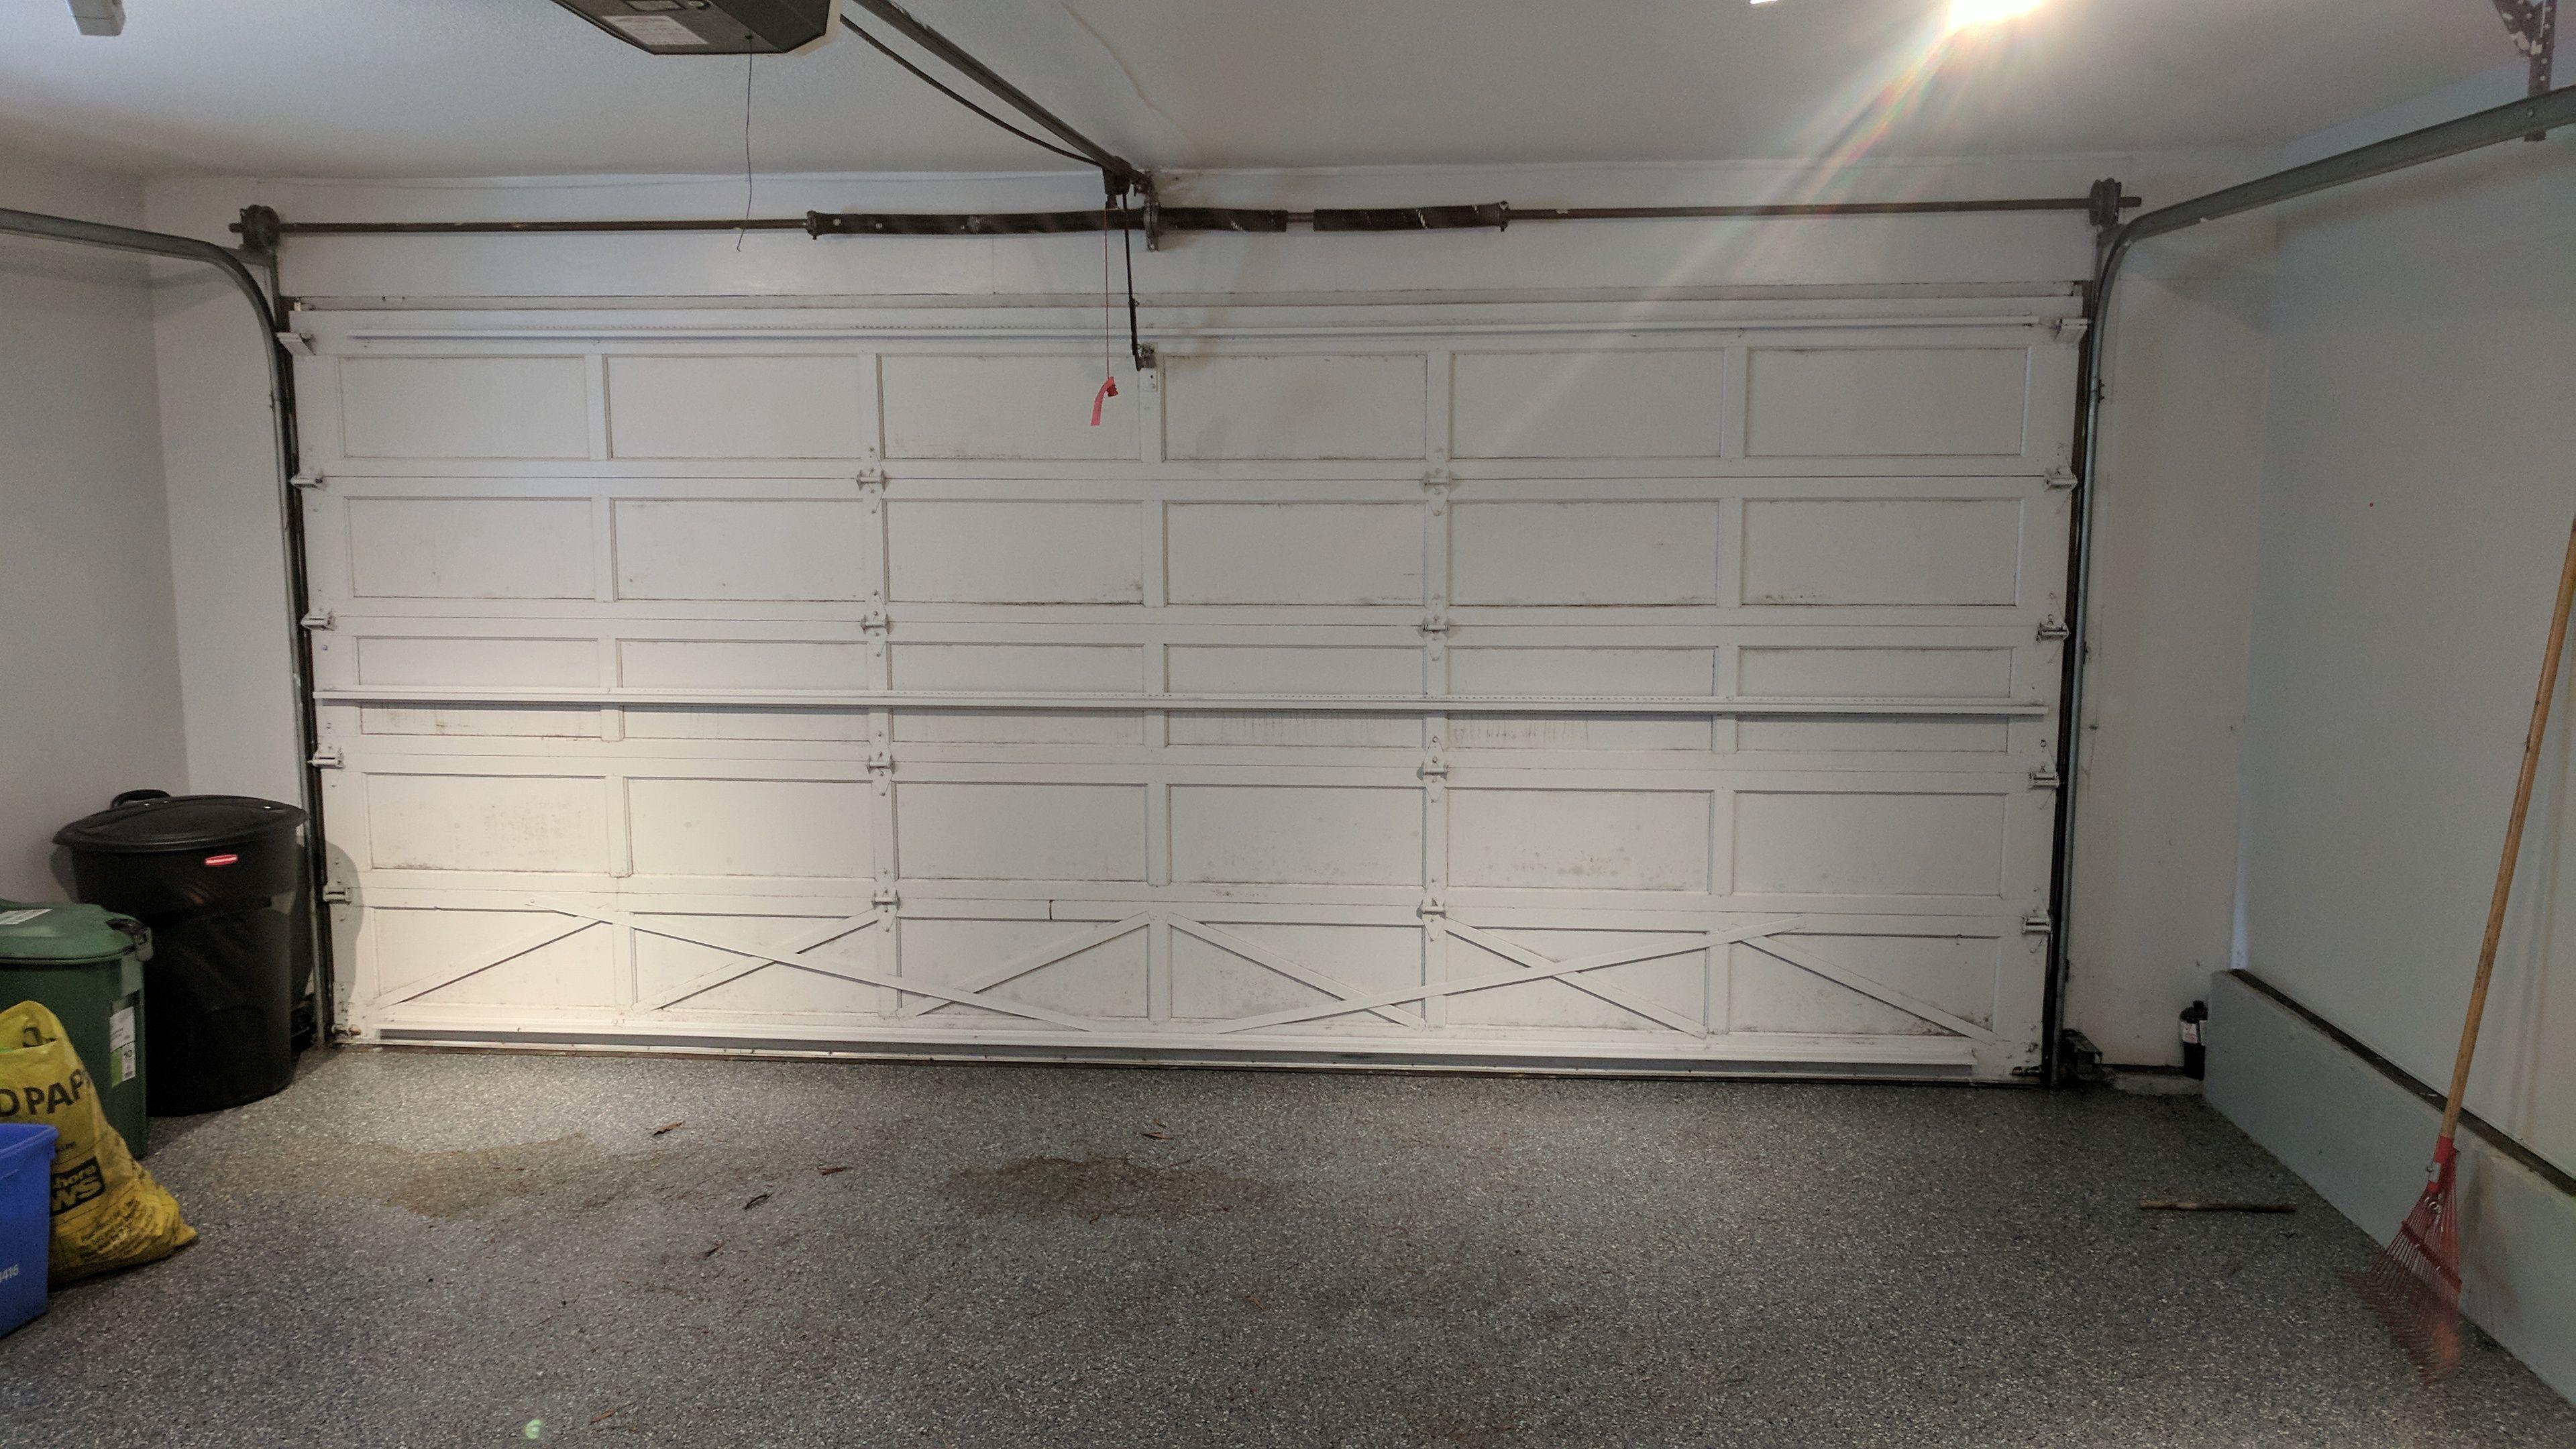 Eventbrite Canadian Garage Door Repair Calgary Presents Garage